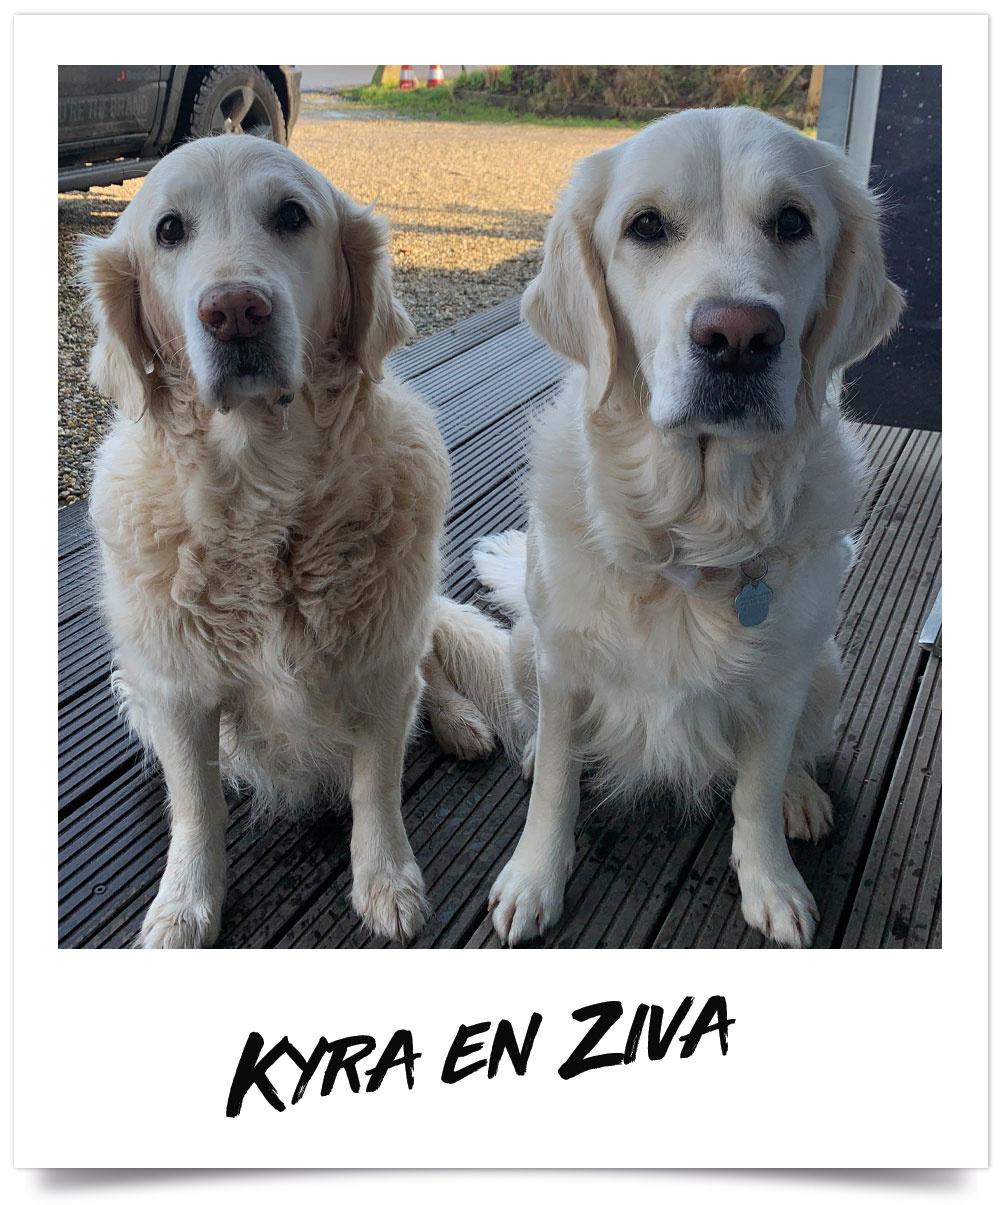 Kyra en Ziva - Eurofuncenter Crew